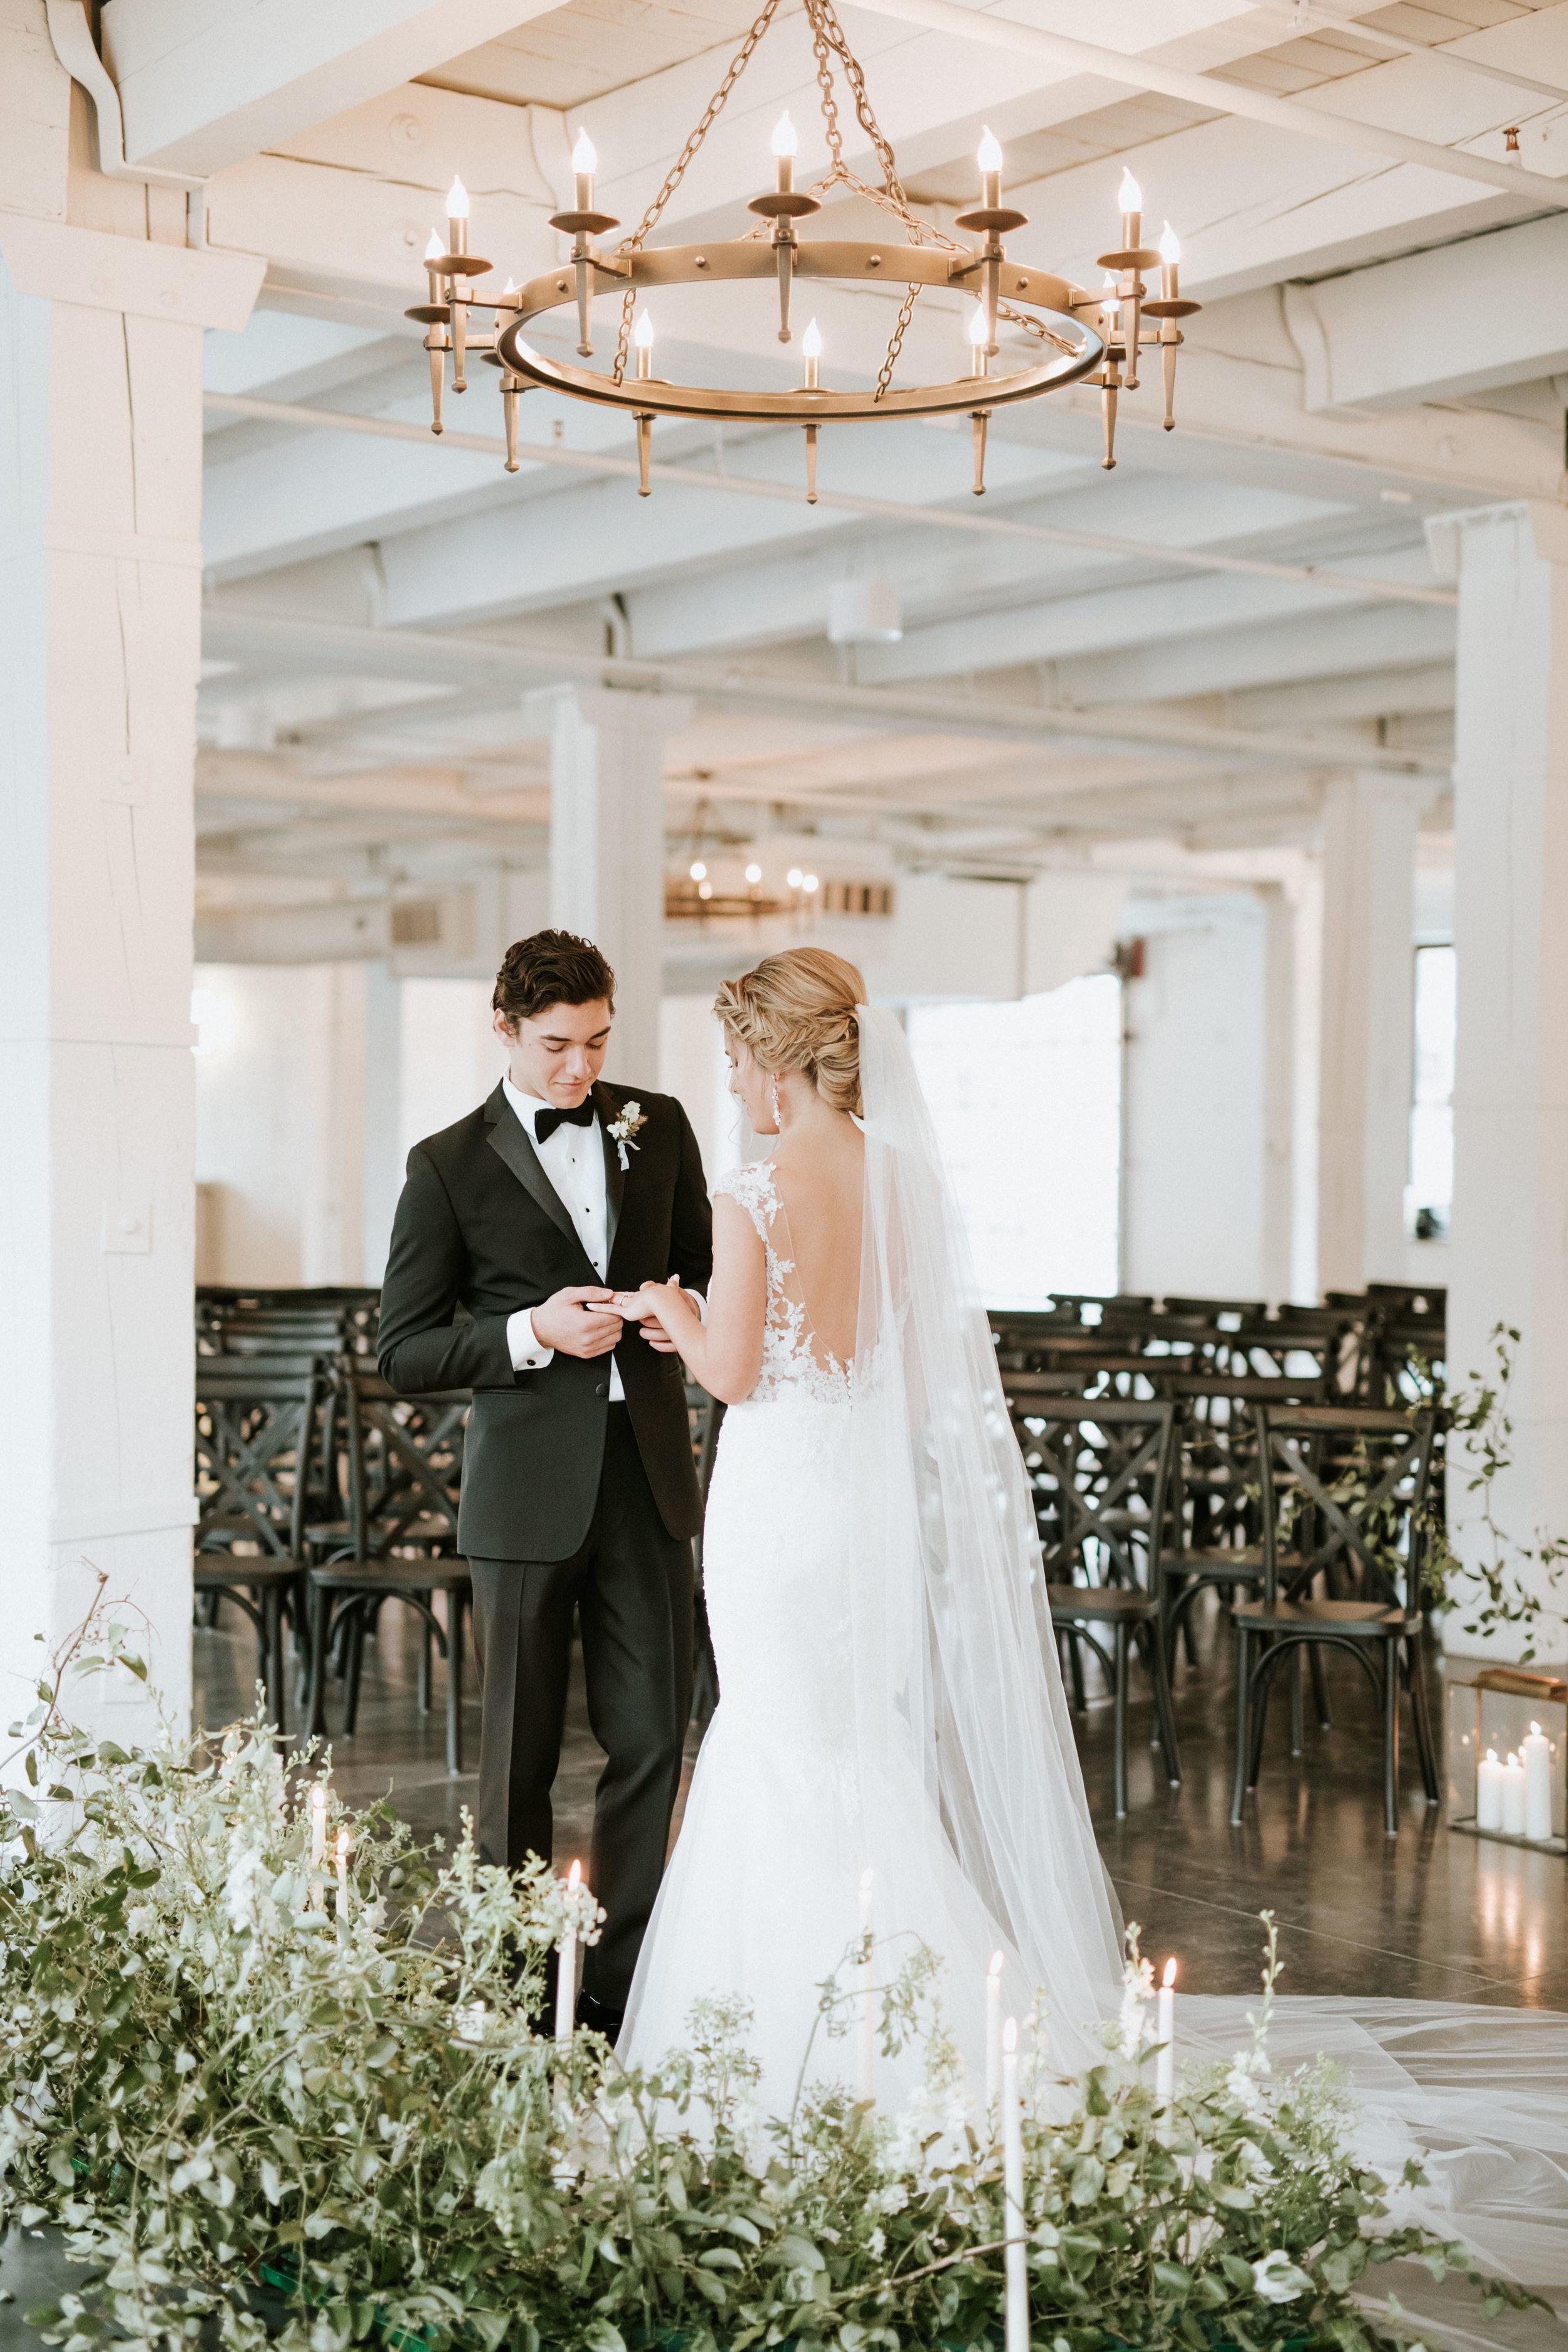 company-251-wedding-shoot-full-resolution-118.jpg